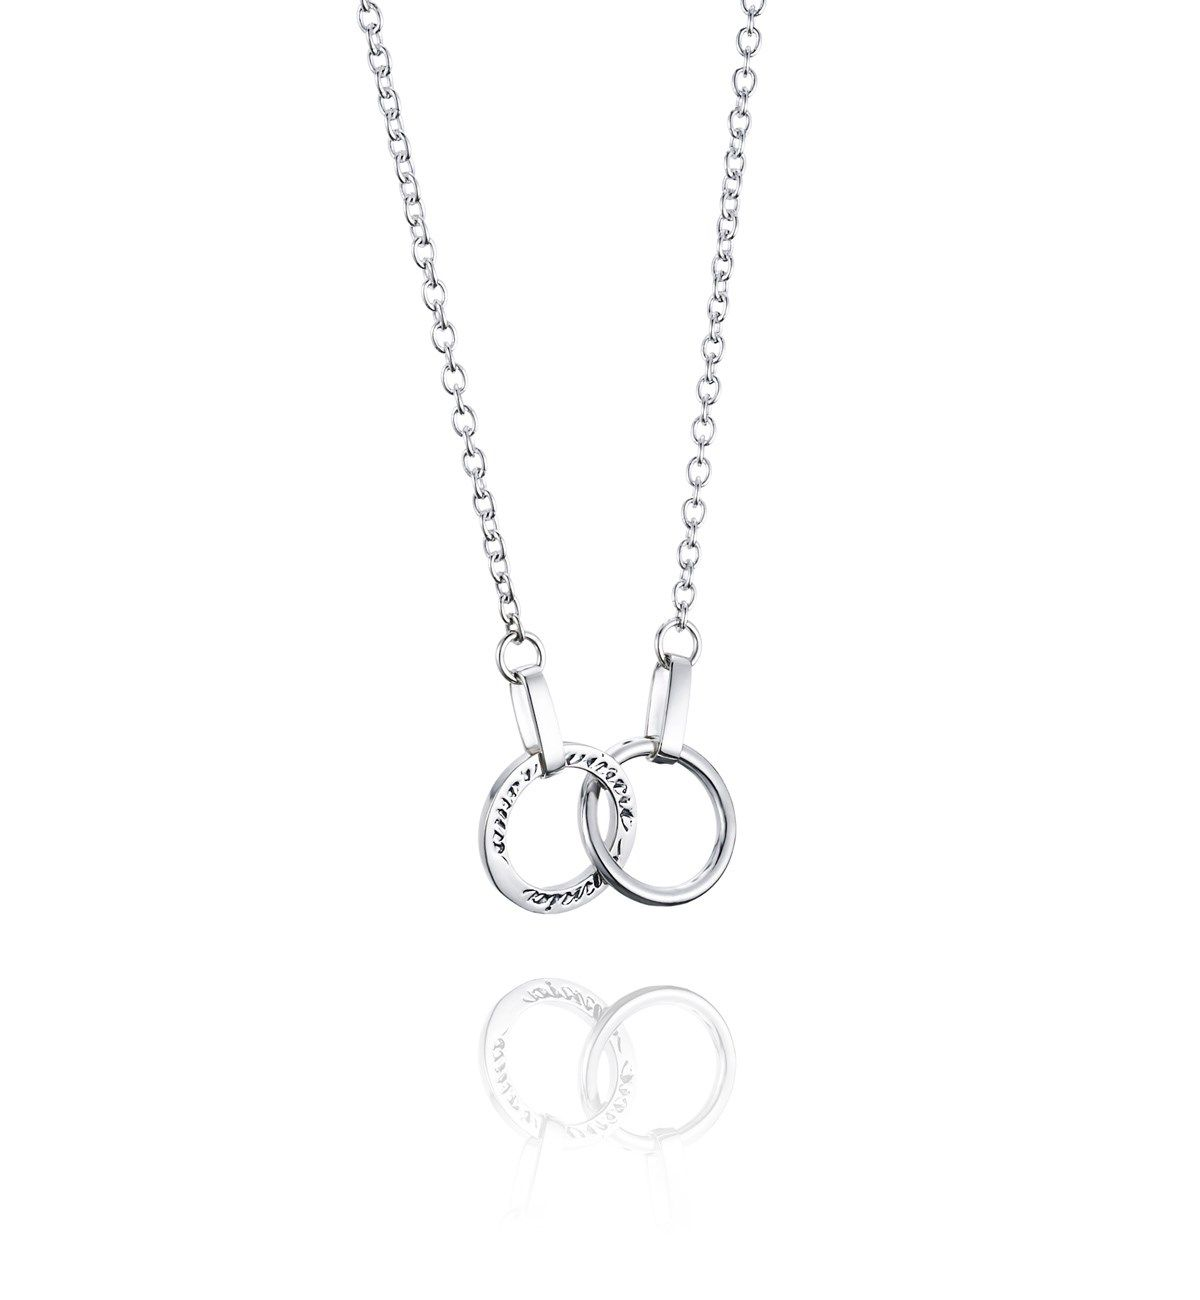 Twosome Necklace - Silver - Halsband - Efva Attling